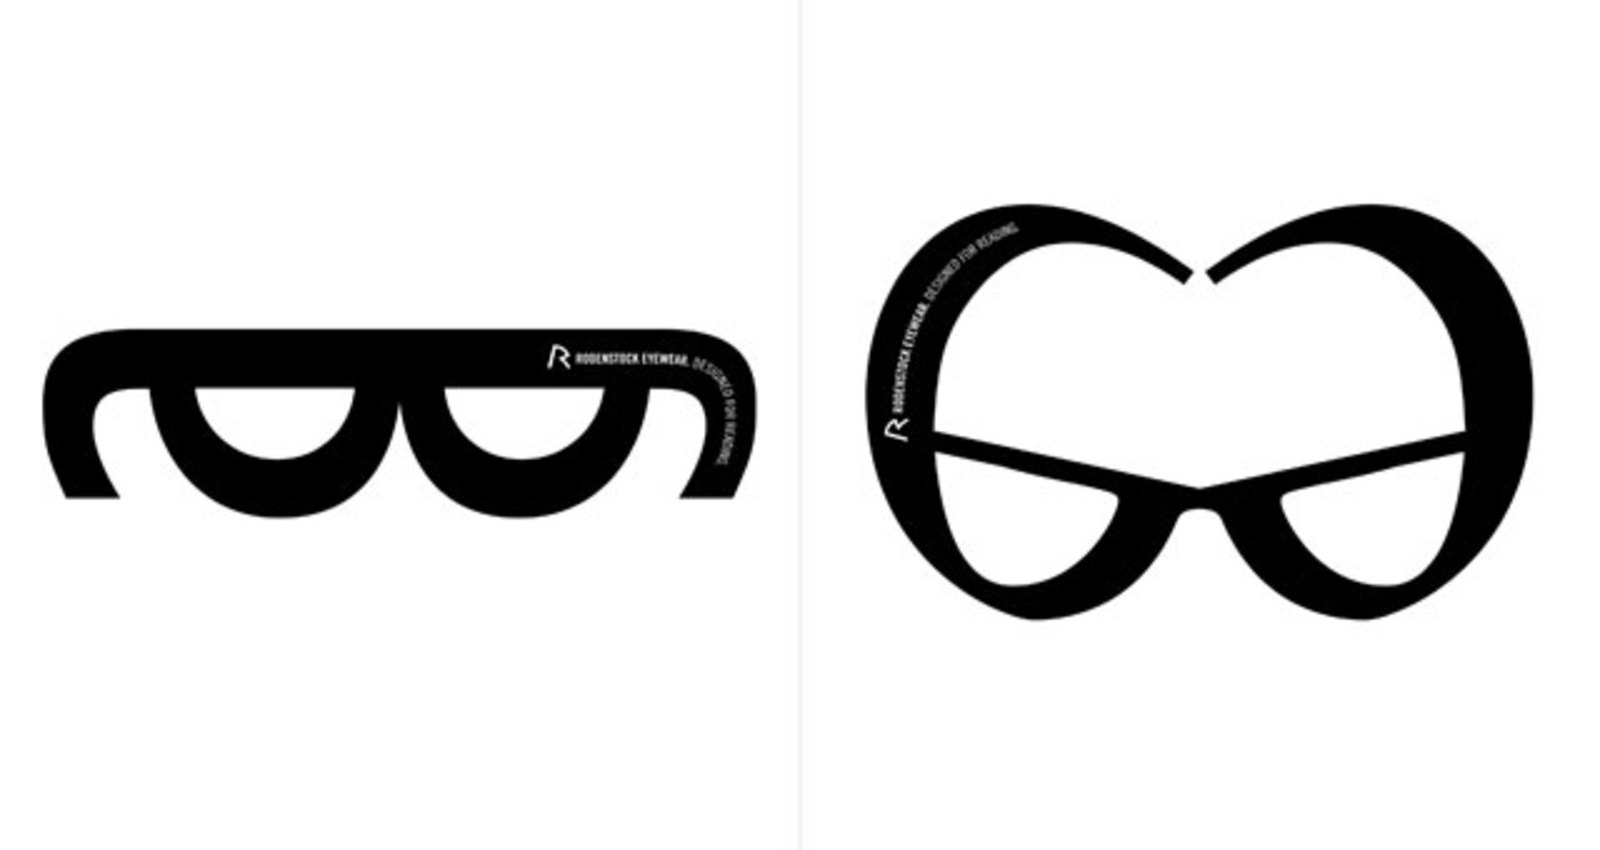 The Rodenstock Font Glasses